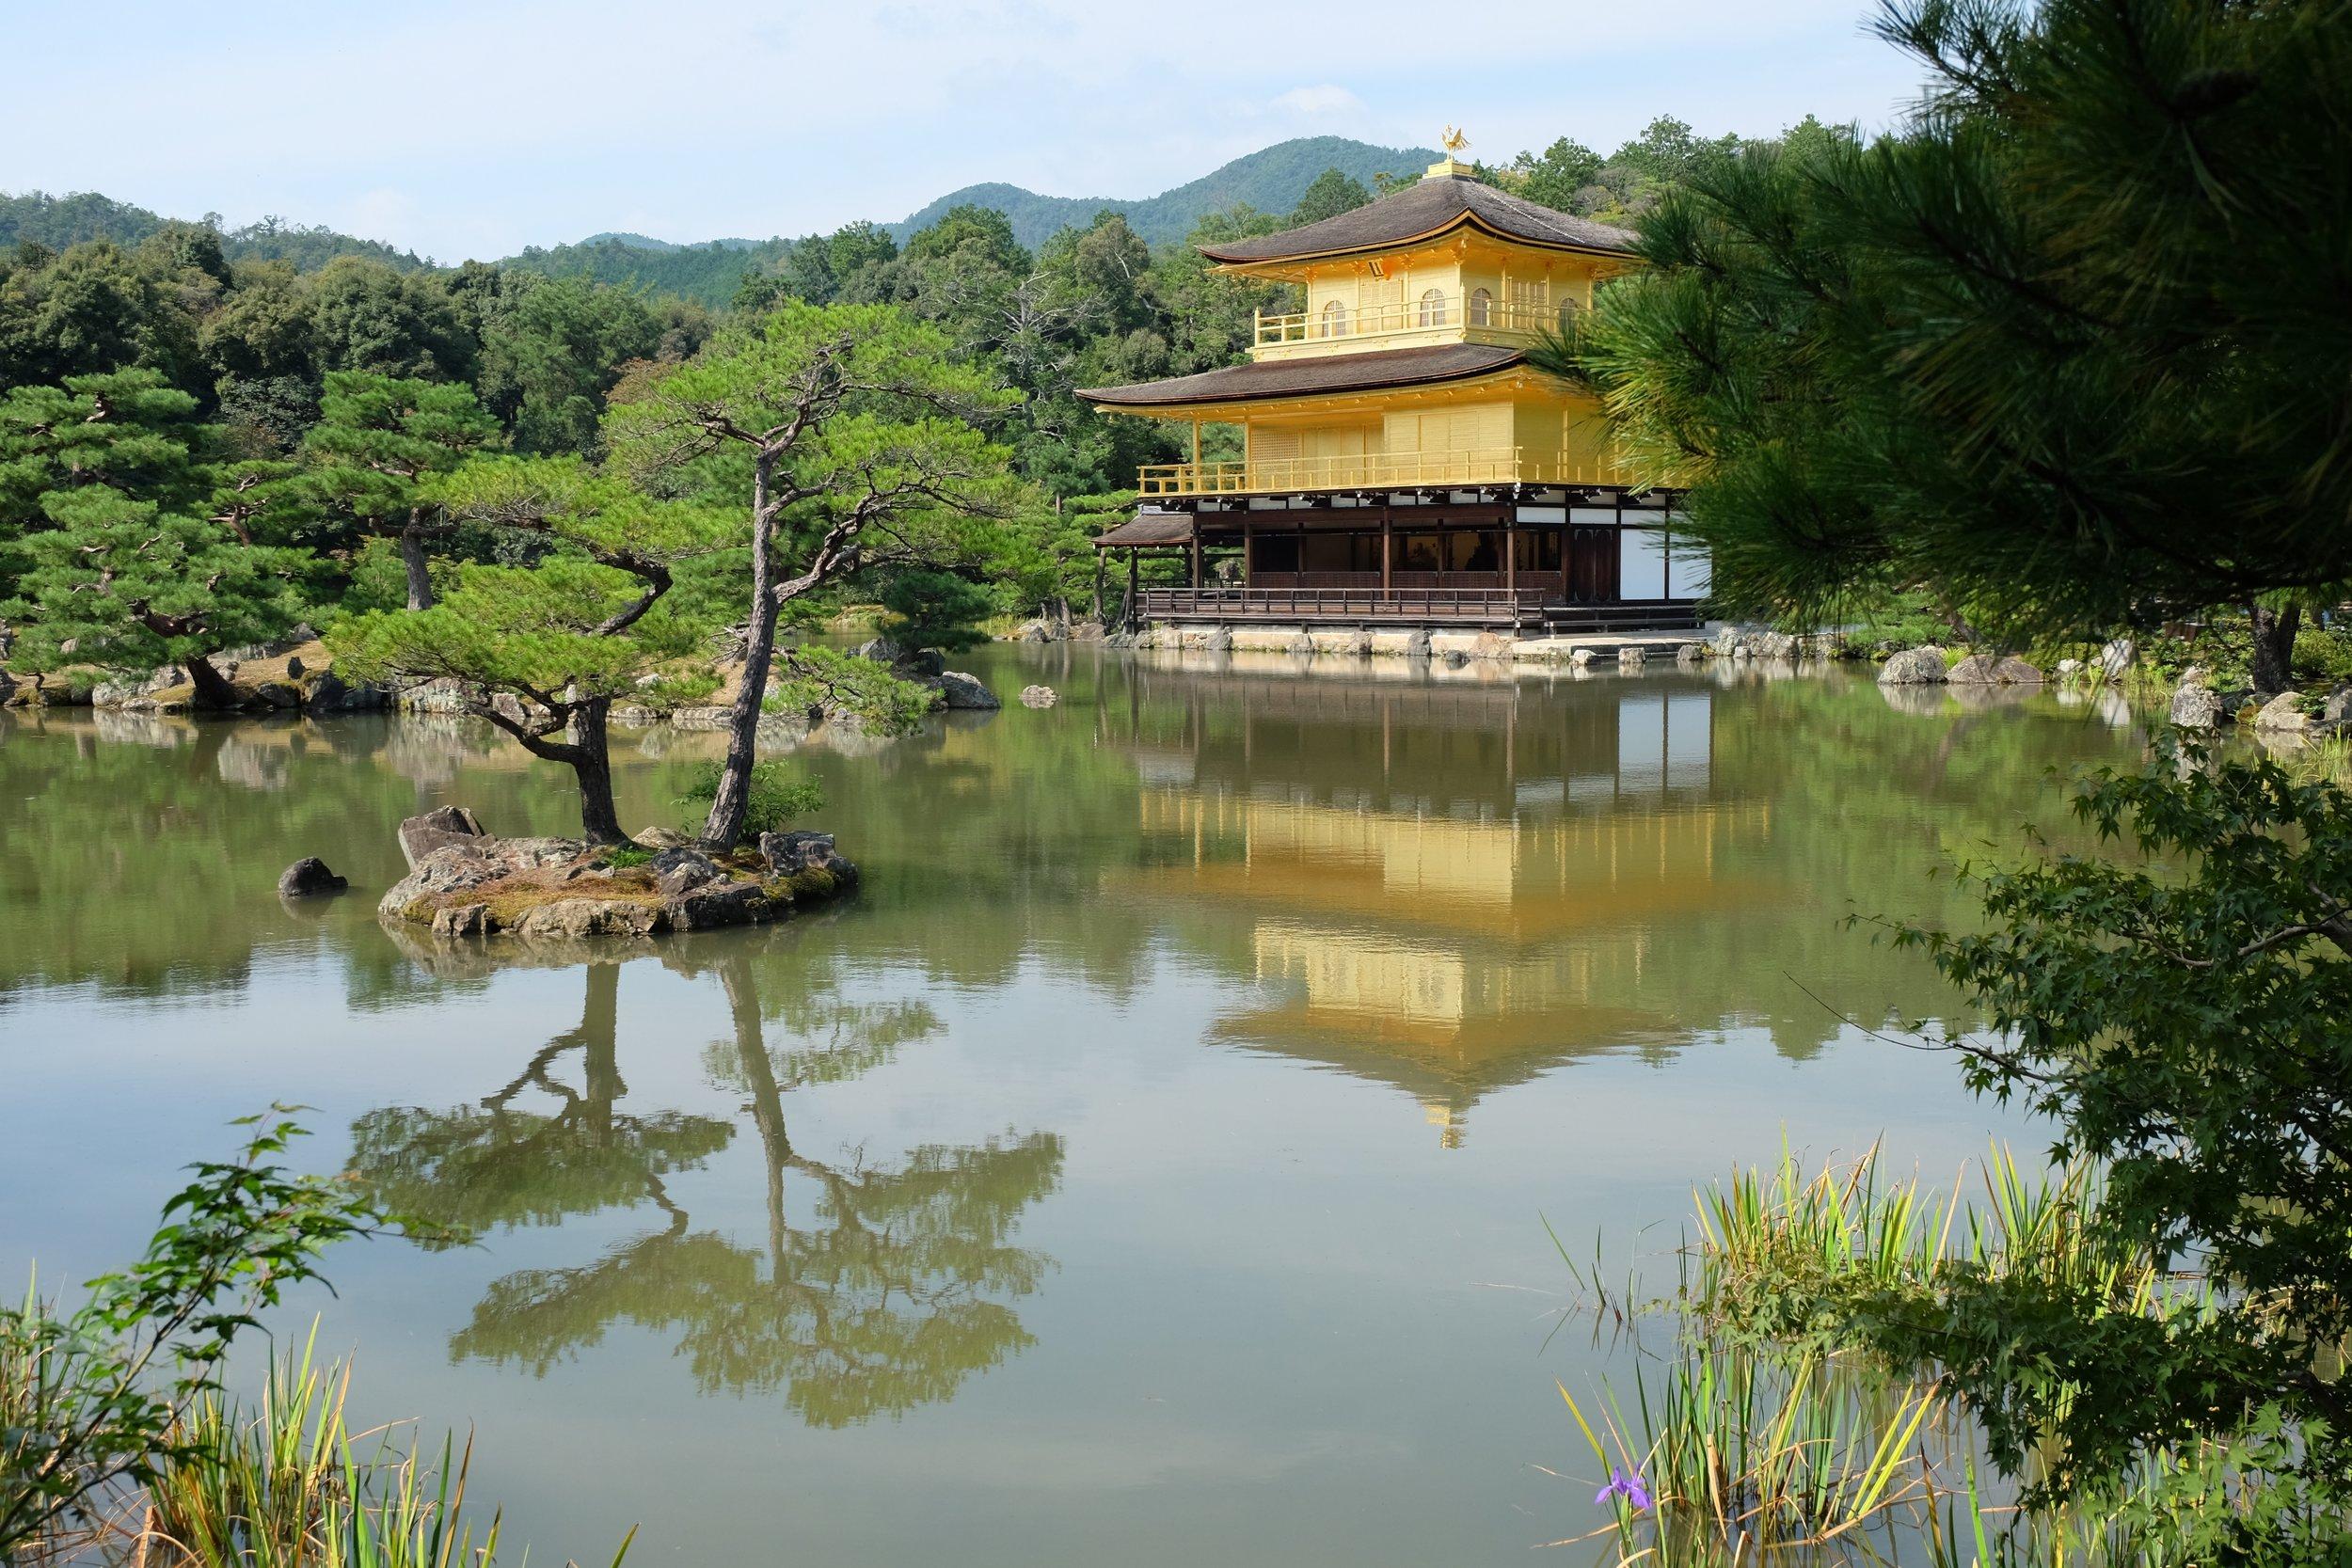 The magical sight of Kinkakuji Temple in Kyoto